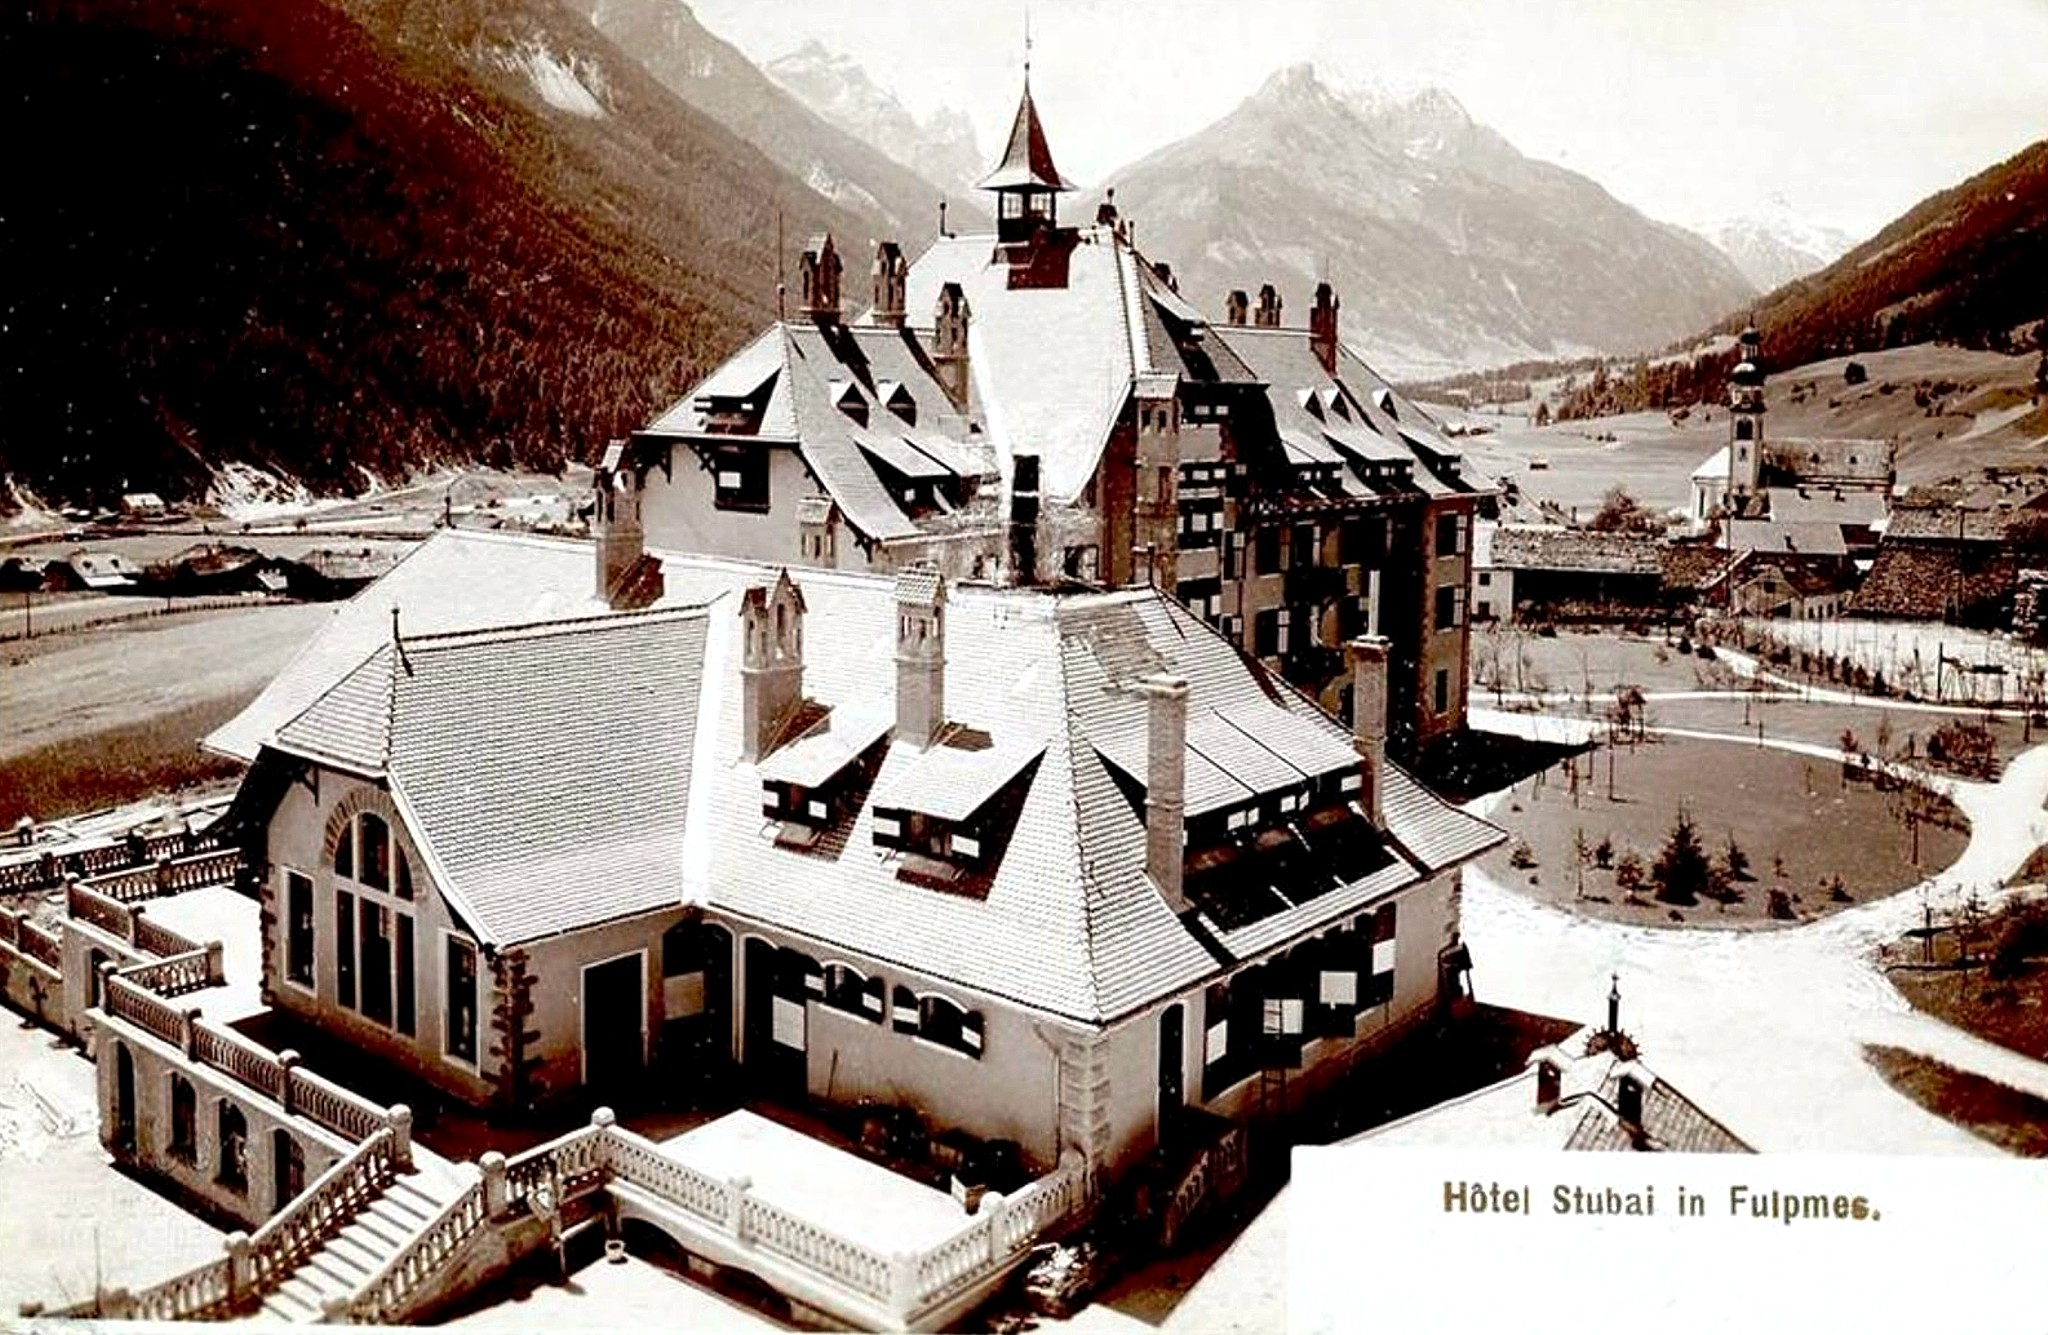 Fulpmes 1899, Hotel Stubai